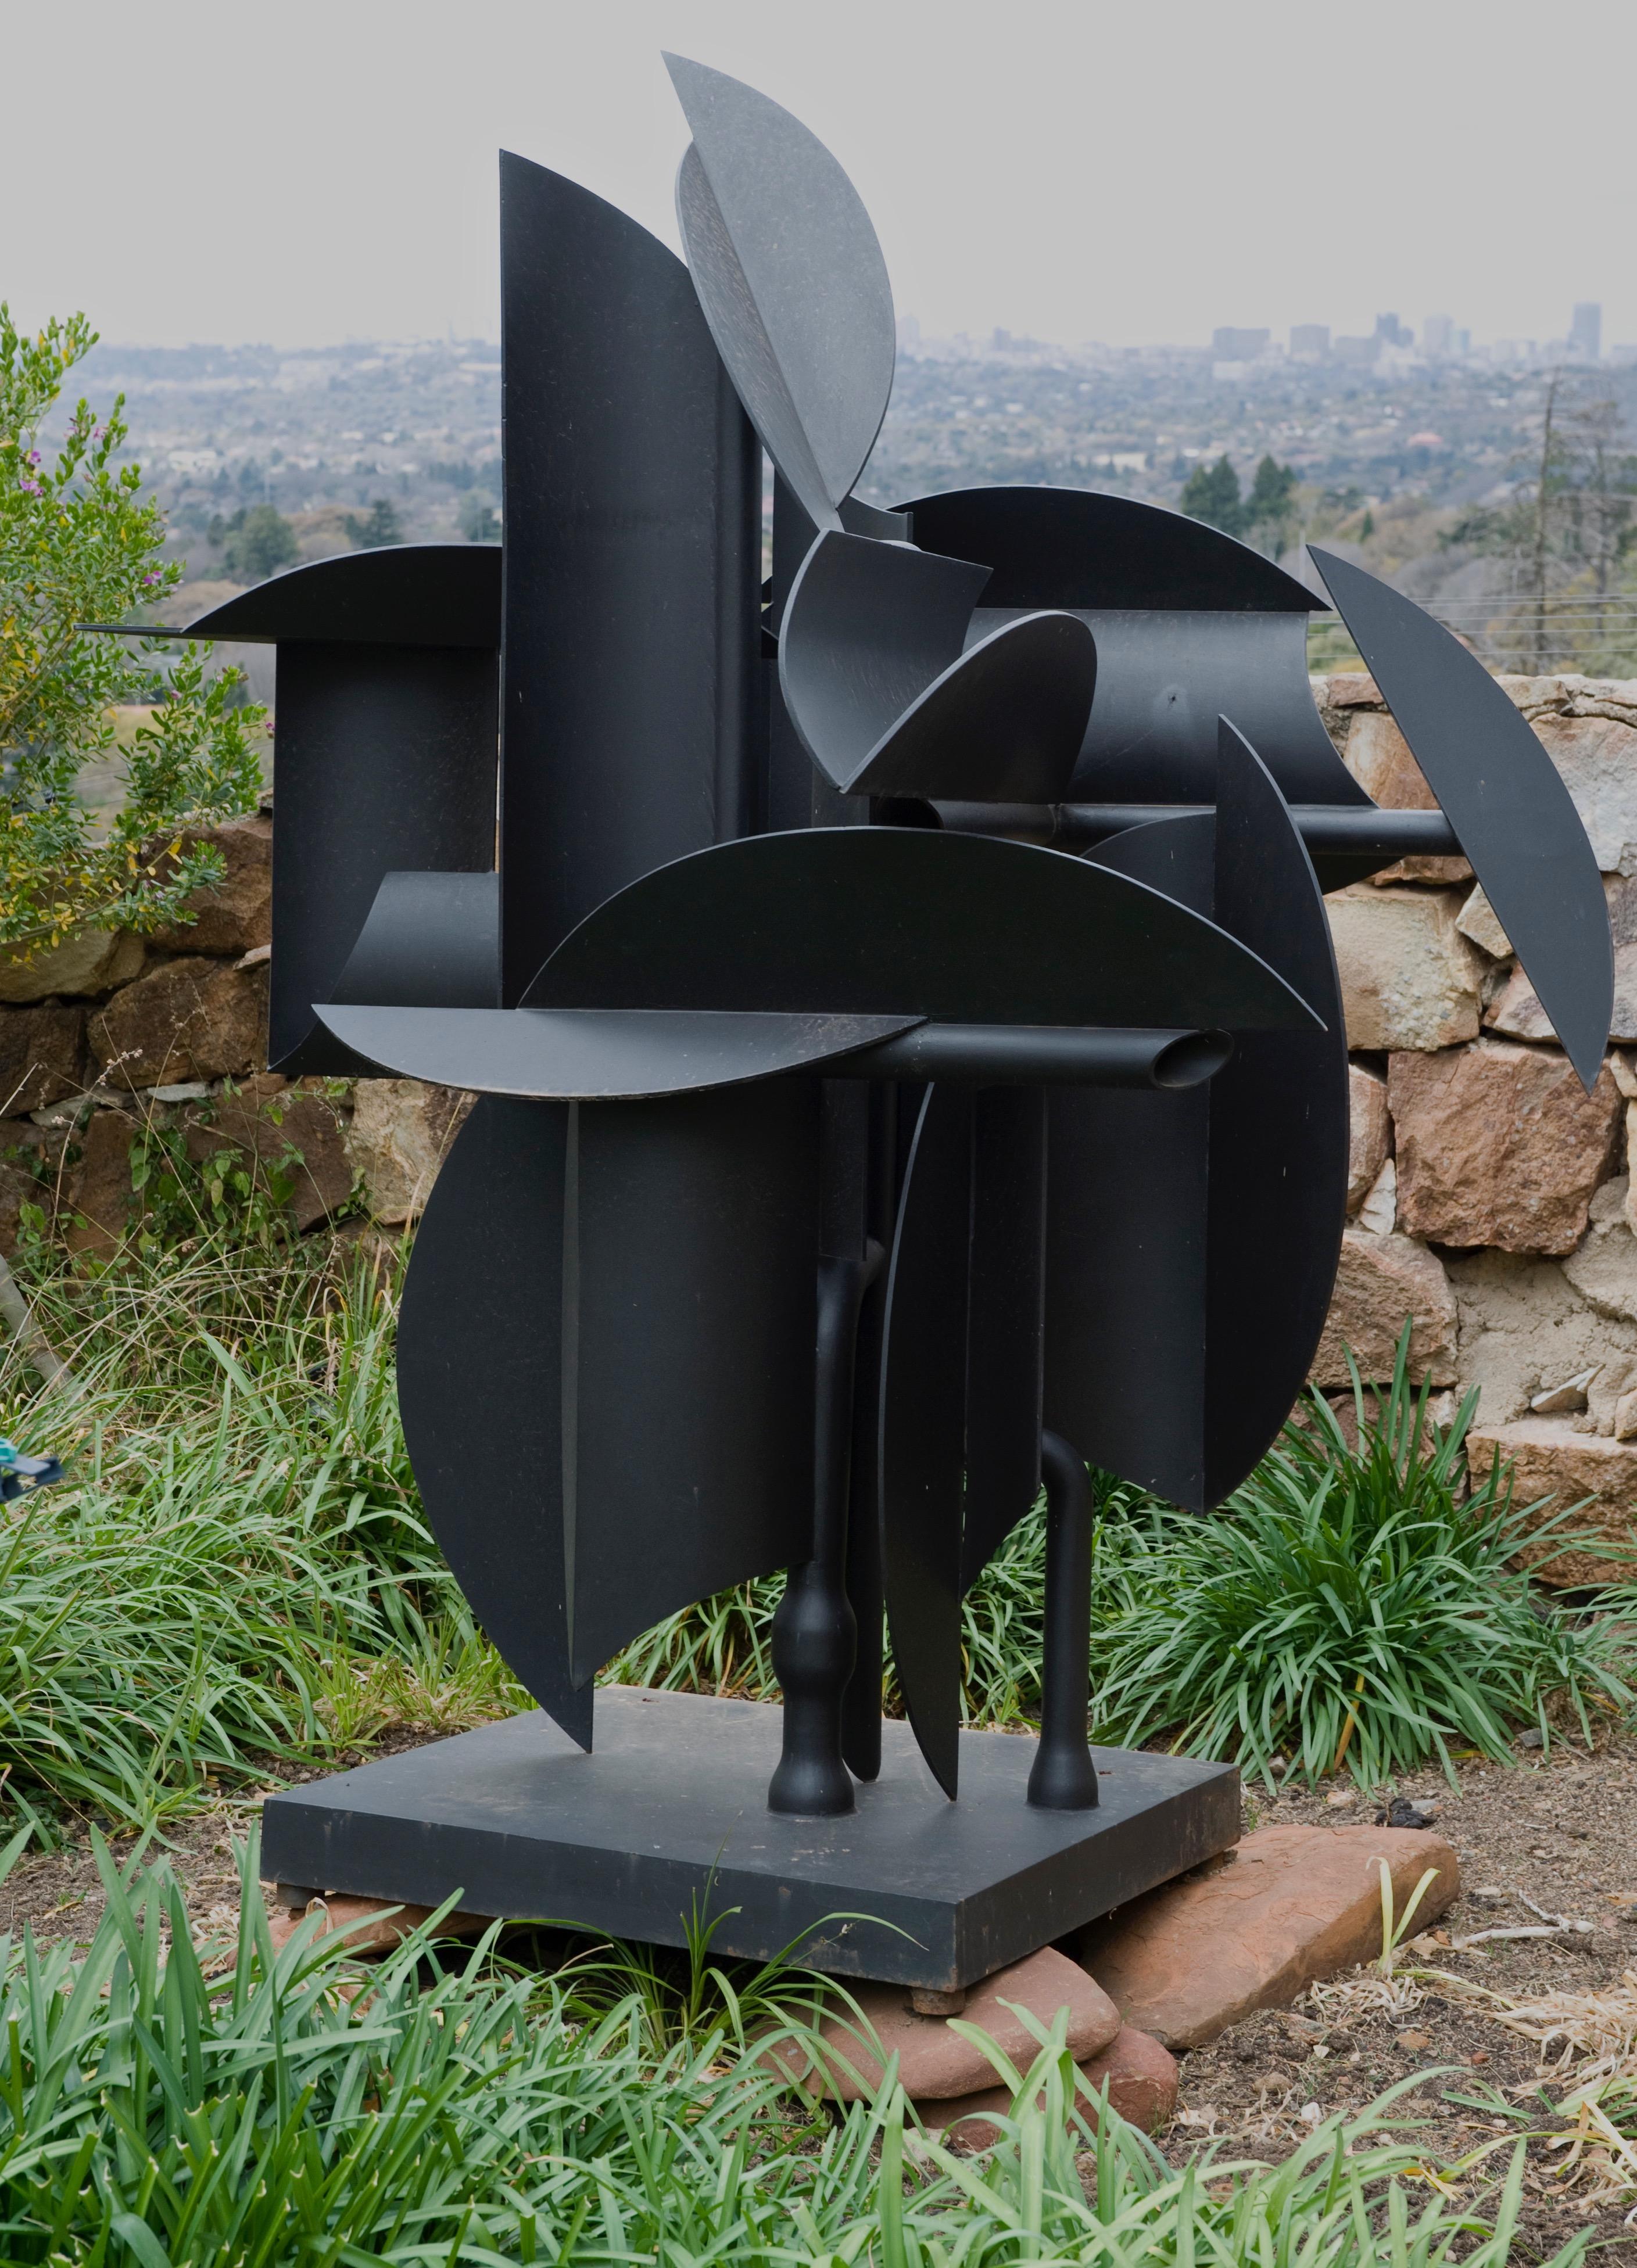 Sien Edoardo Villa se beeldhouwerk in Johannesburg